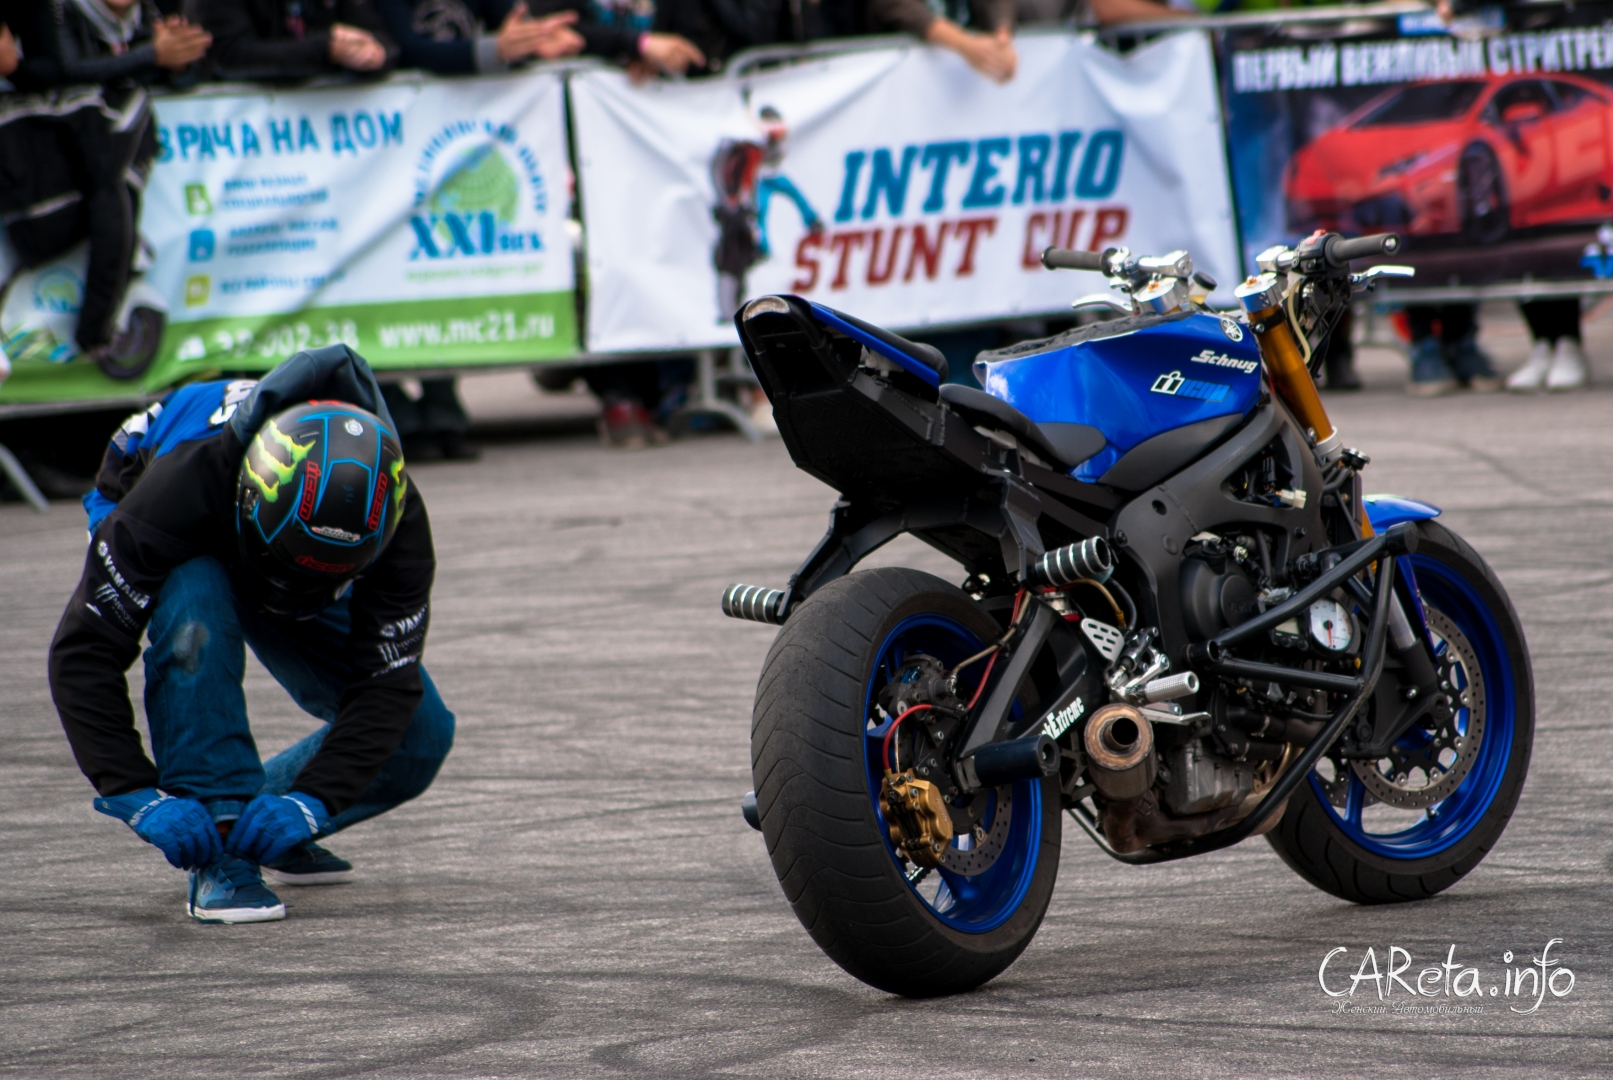 INTERIO Stunt Cup 2015 - праздник двухколесного экстрима